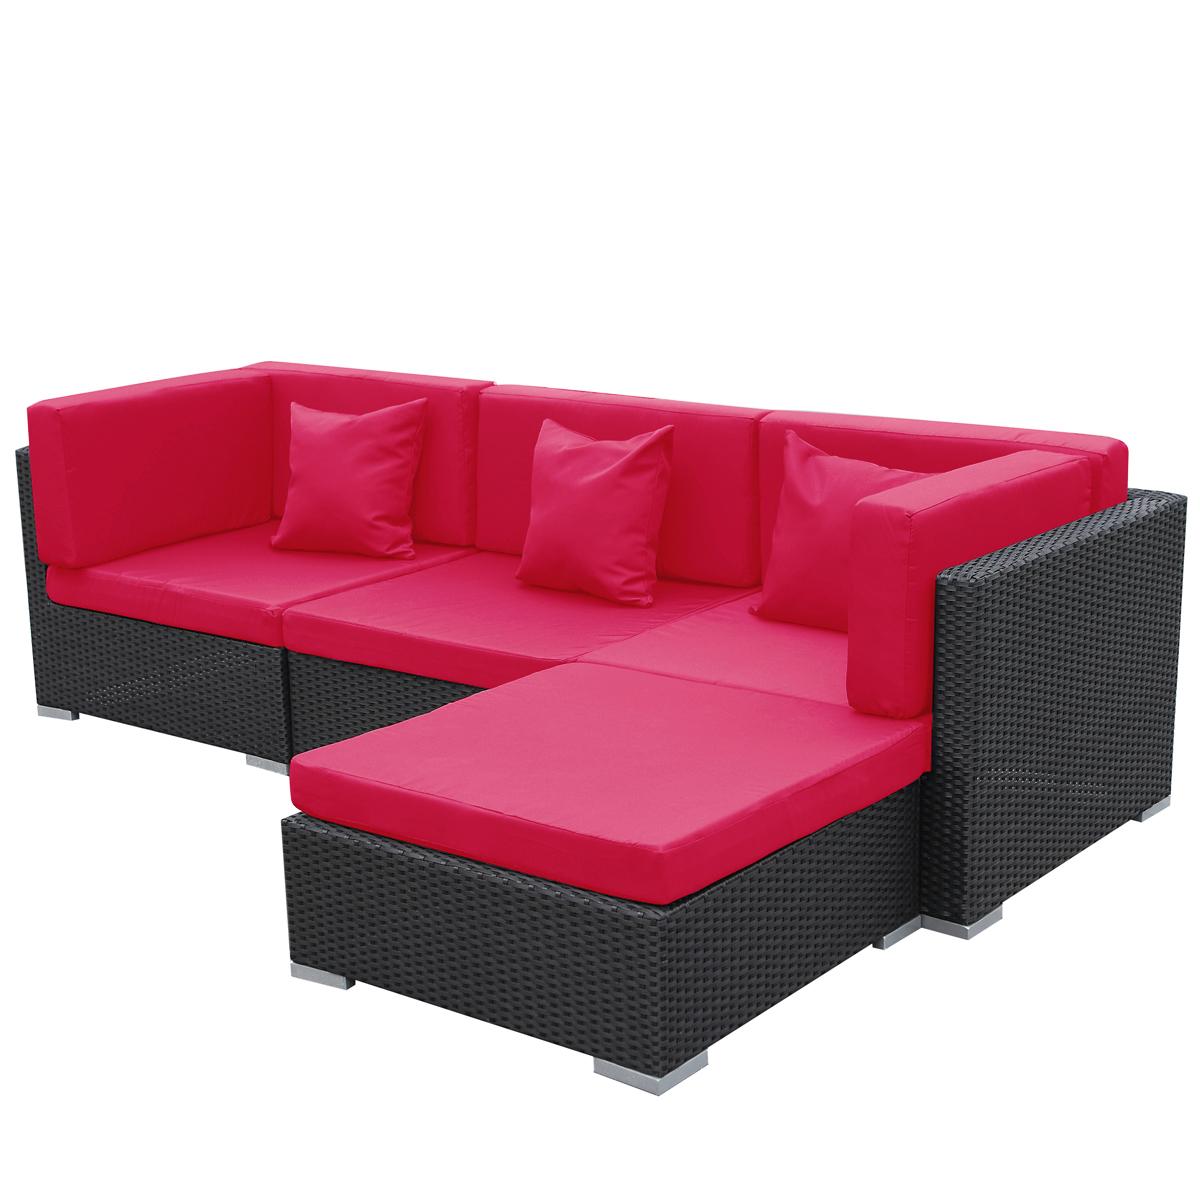 gartenm bel gartenlounge polyrattan sofa bergen rot schwarz aluminium ebay. Black Bedroom Furniture Sets. Home Design Ideas